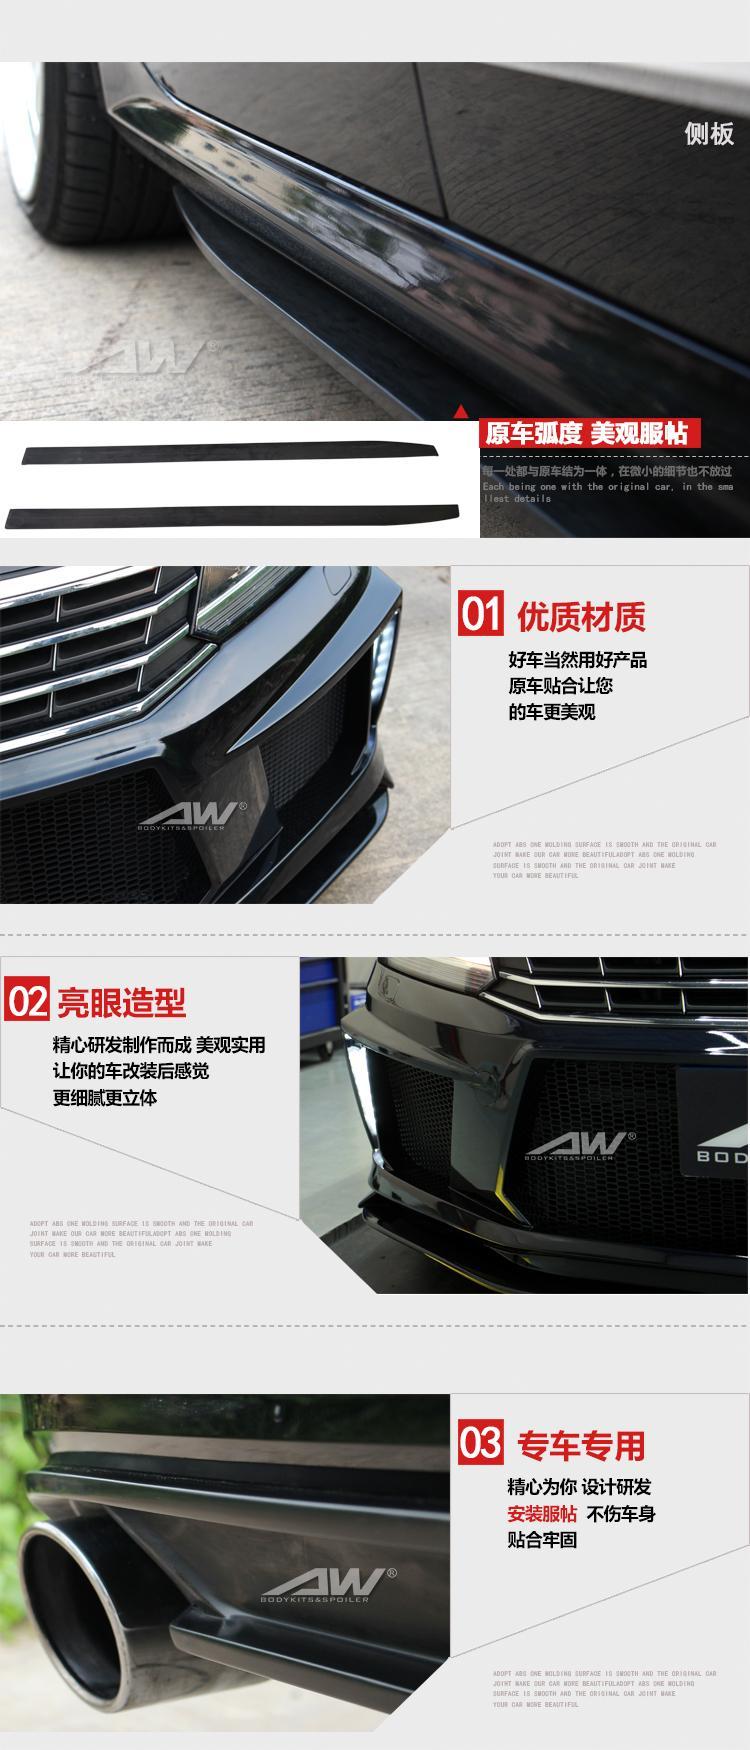 Volkswagen Passat 17 Body Kits Front Bumper Car modification  8